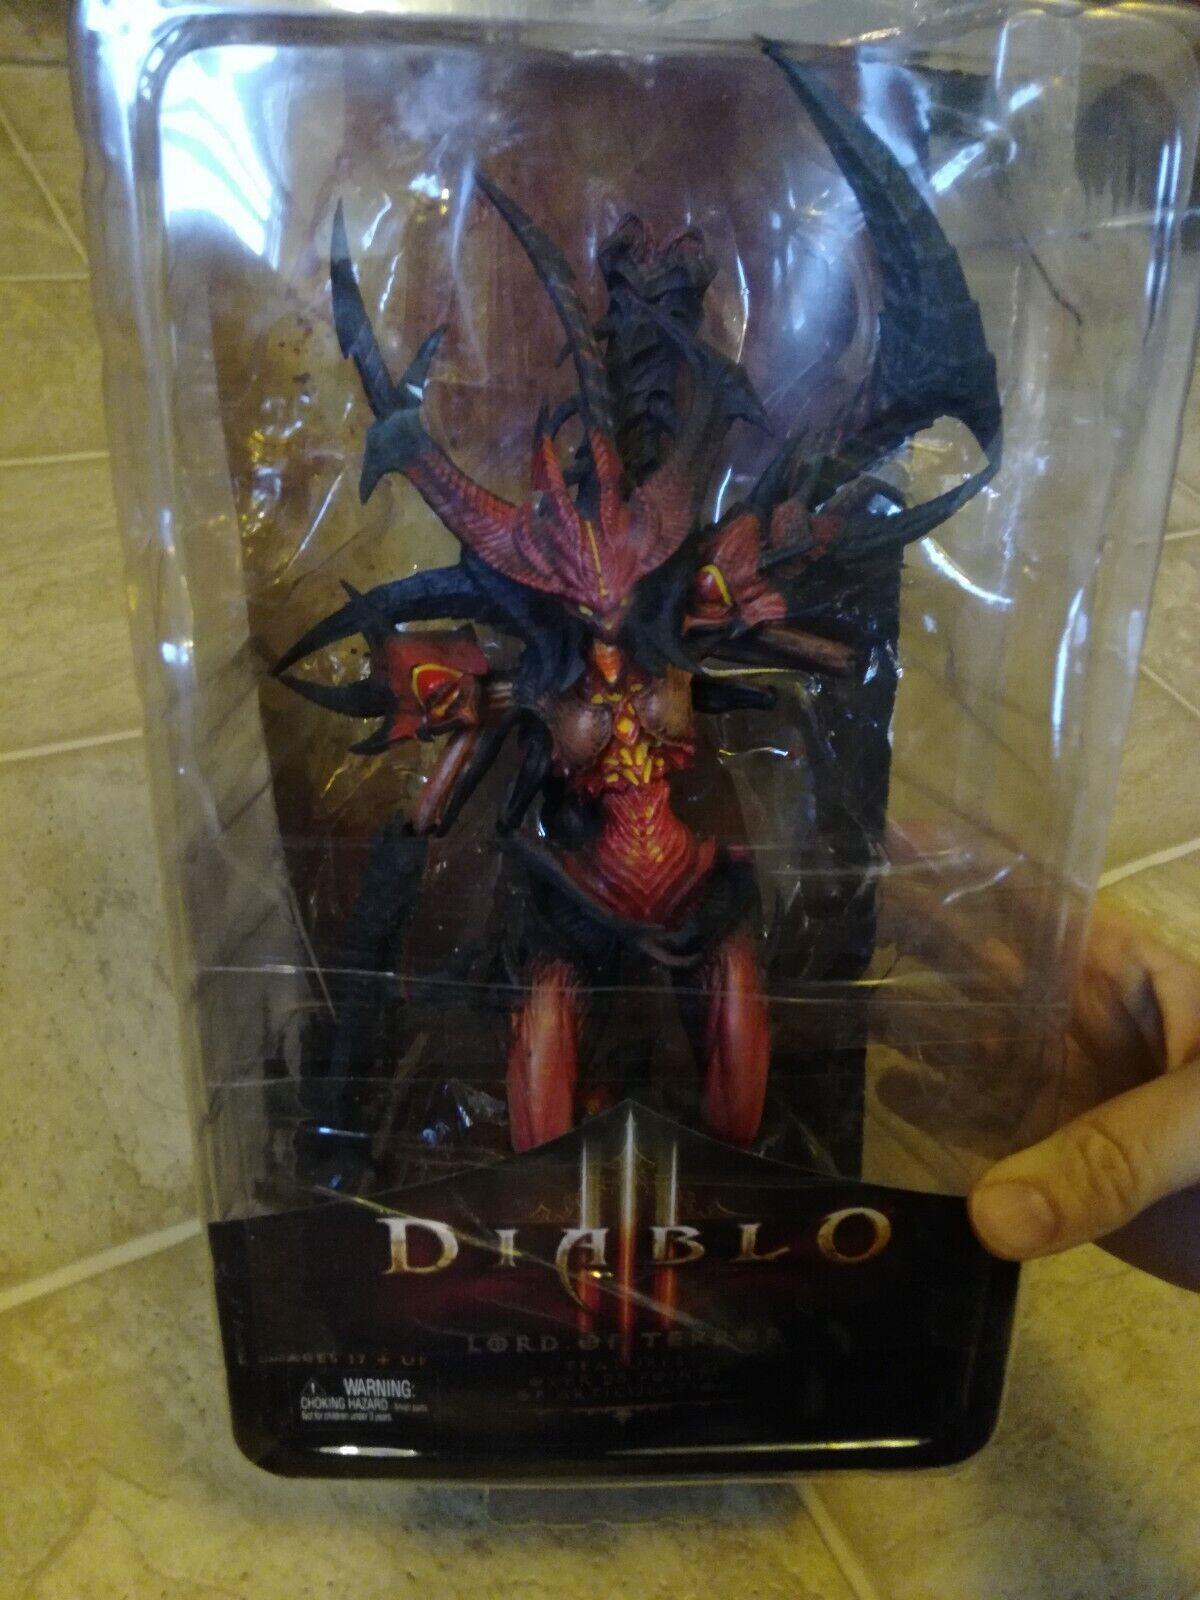 NECA Blizzard Diablo - III (3)  Lord of Terror Action Figure (A11) damaged box